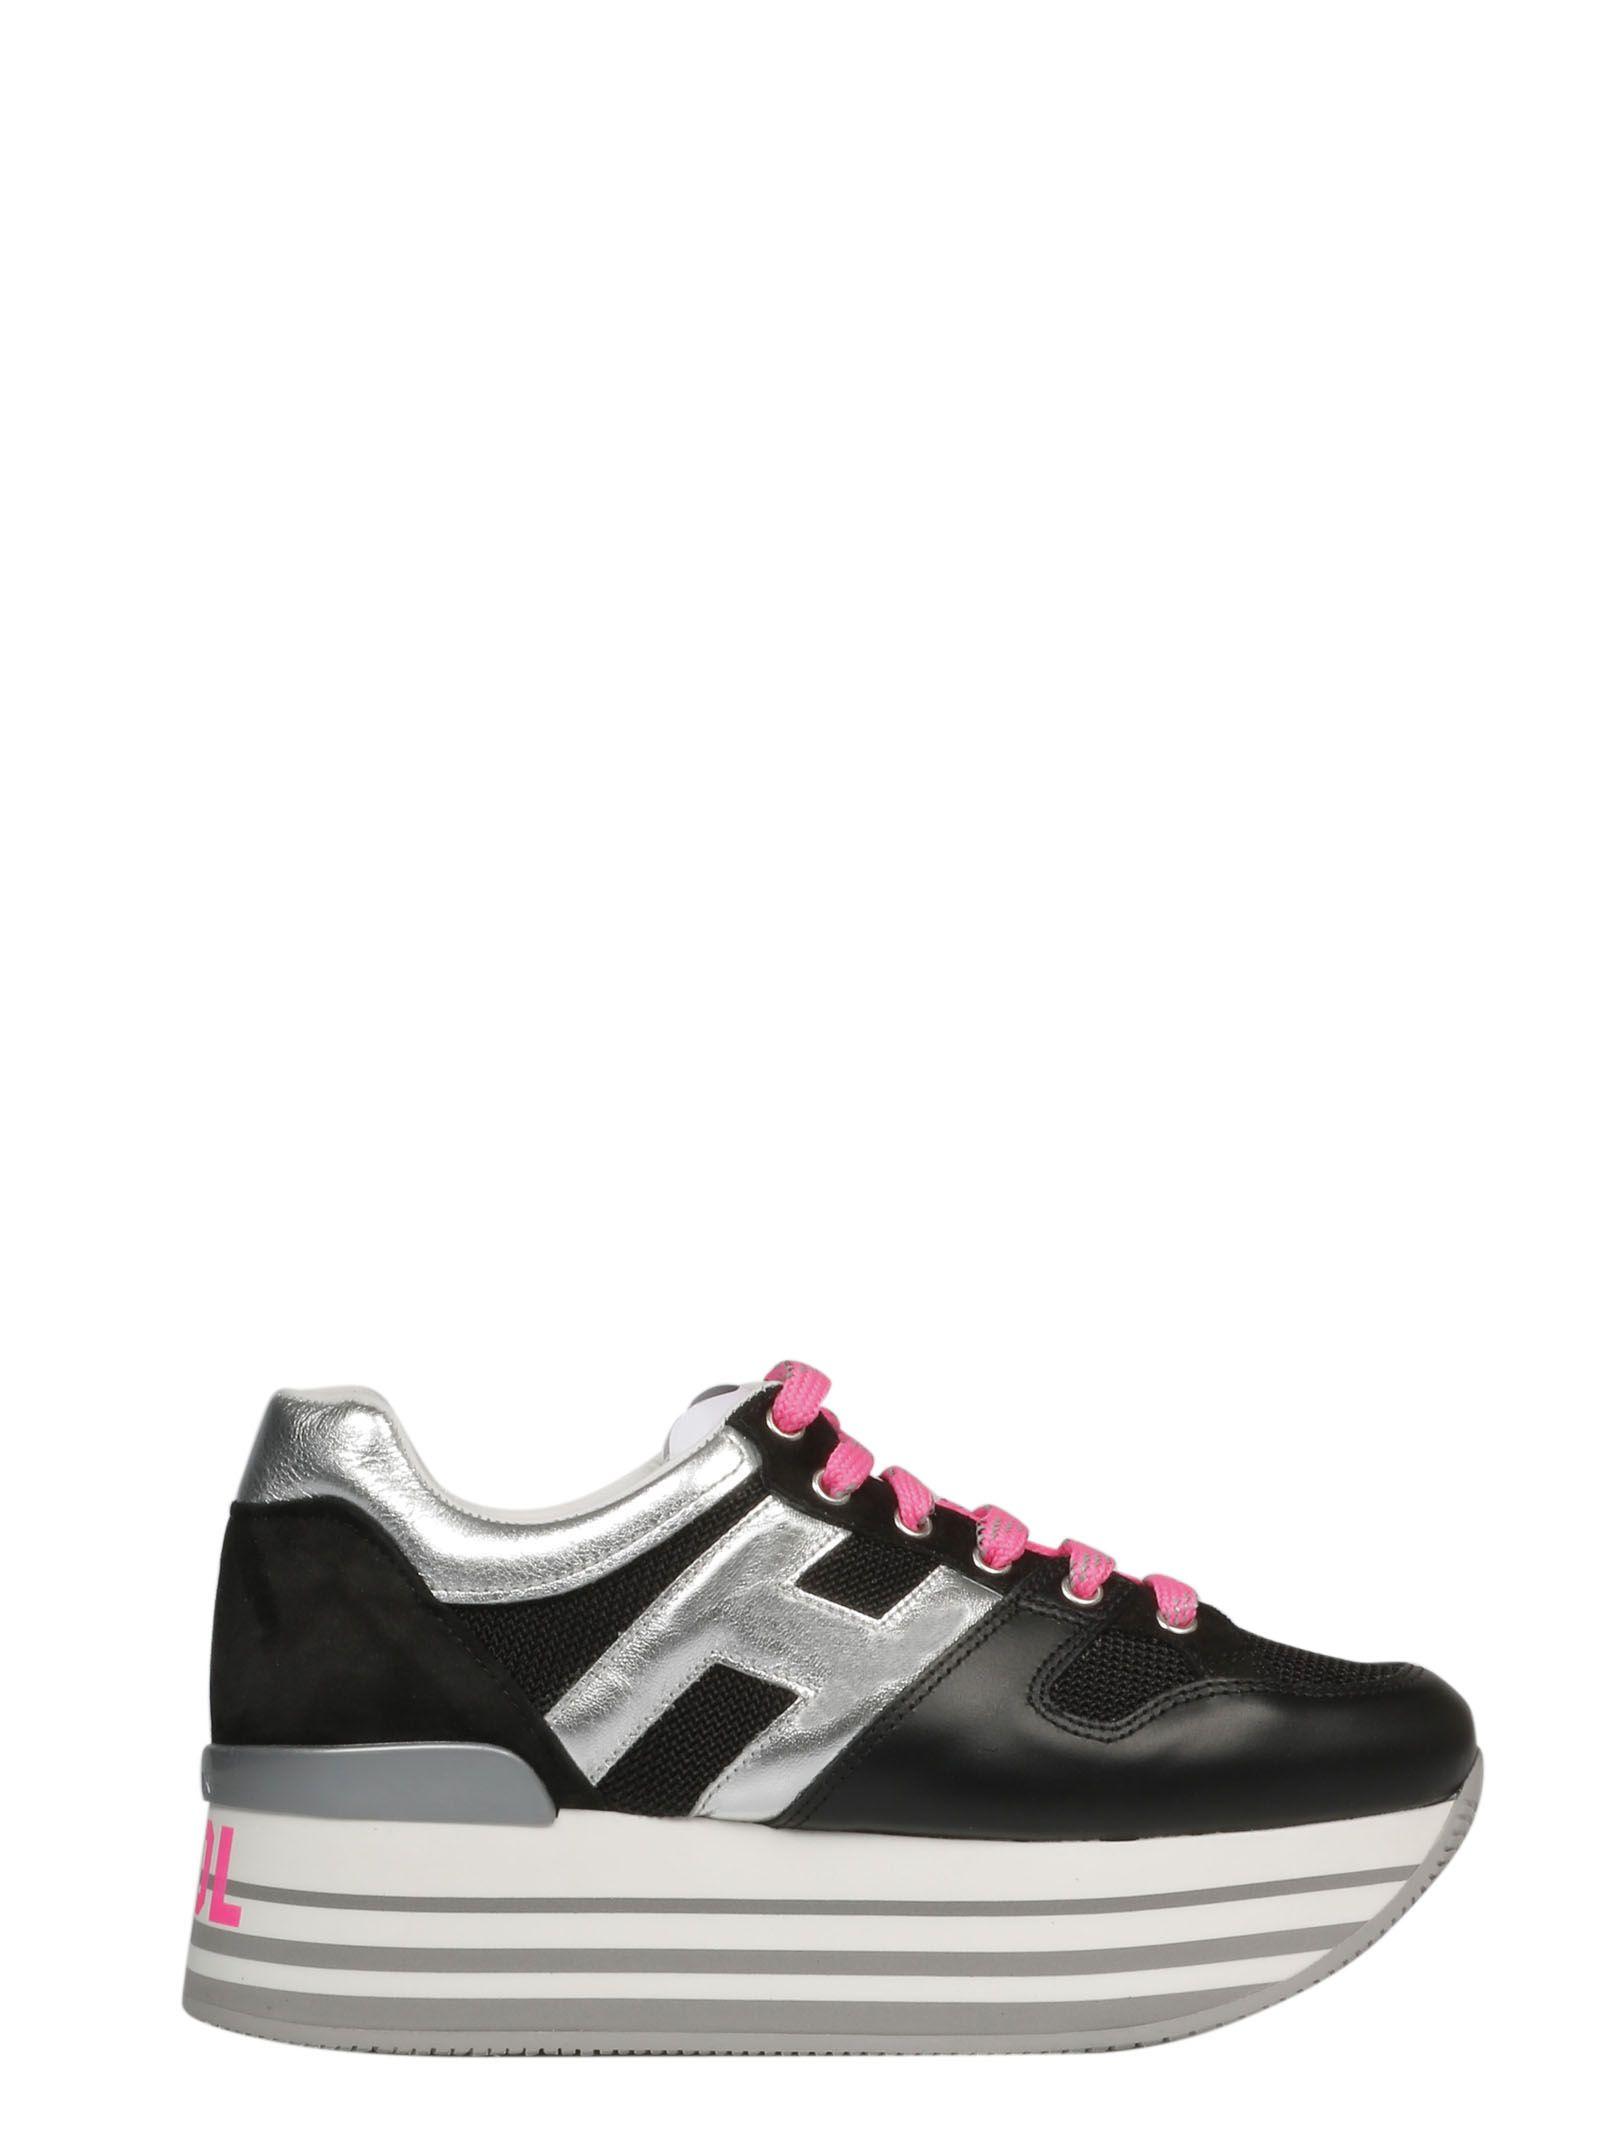 3673458f781 Hogan Hogan Striped Platform Sneakers - Basic - 10882090